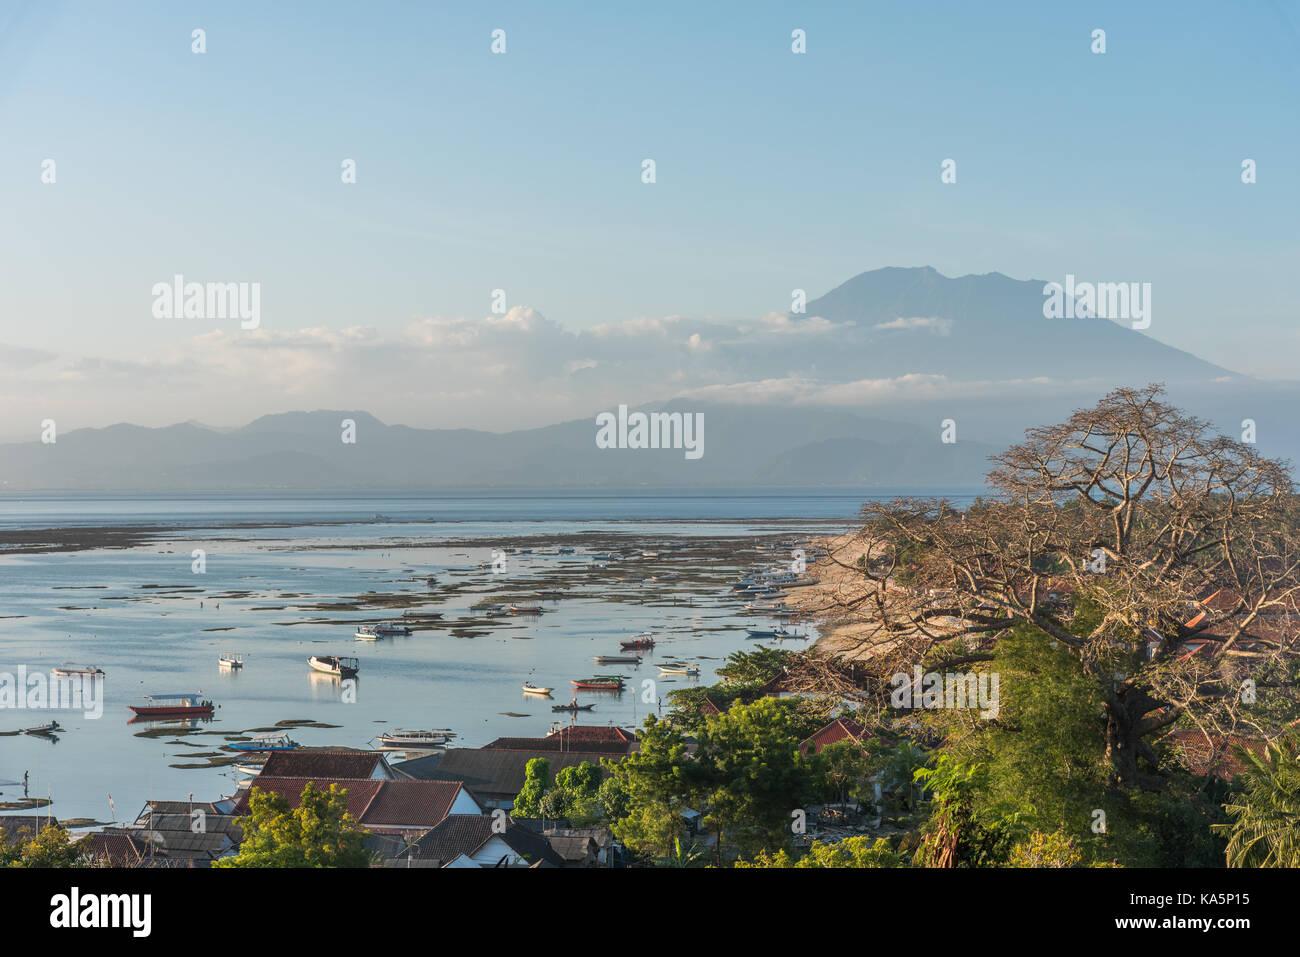 Beautiful view from Panorama point on the island Nusa Lembongan over Jungut Batu beach and the rumbling Vulcan Agung - Stock Image